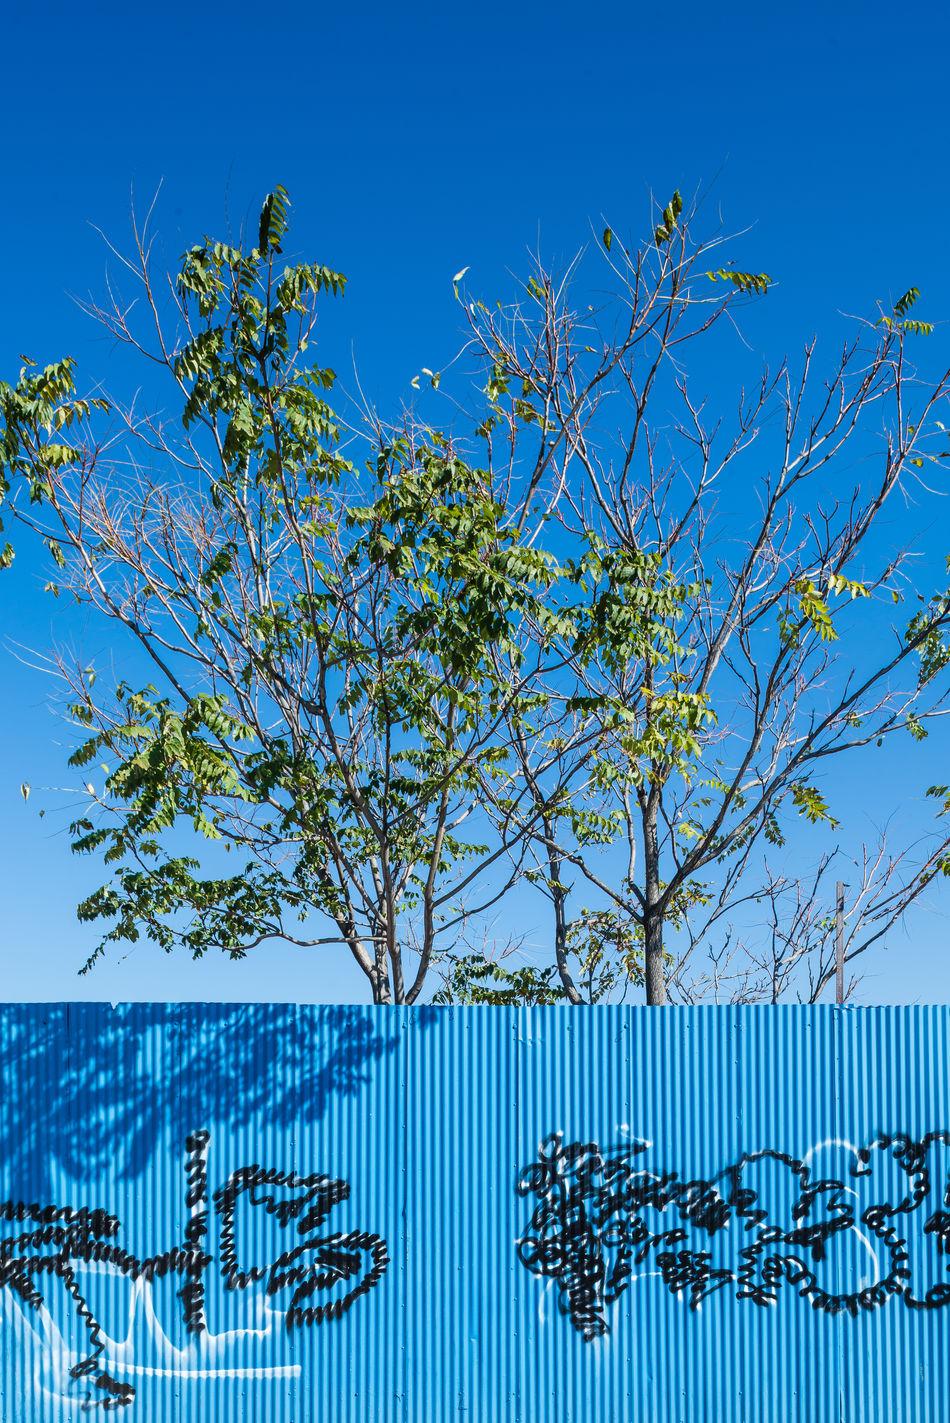 Blue Sky Branch Brooklyn Color Blue Colors Fence Gowanus GowanusCanal Green Color Hidden Places New York New York City Newyork Newyorkcity Outdoors Pastel Power Tree USA USA Photos